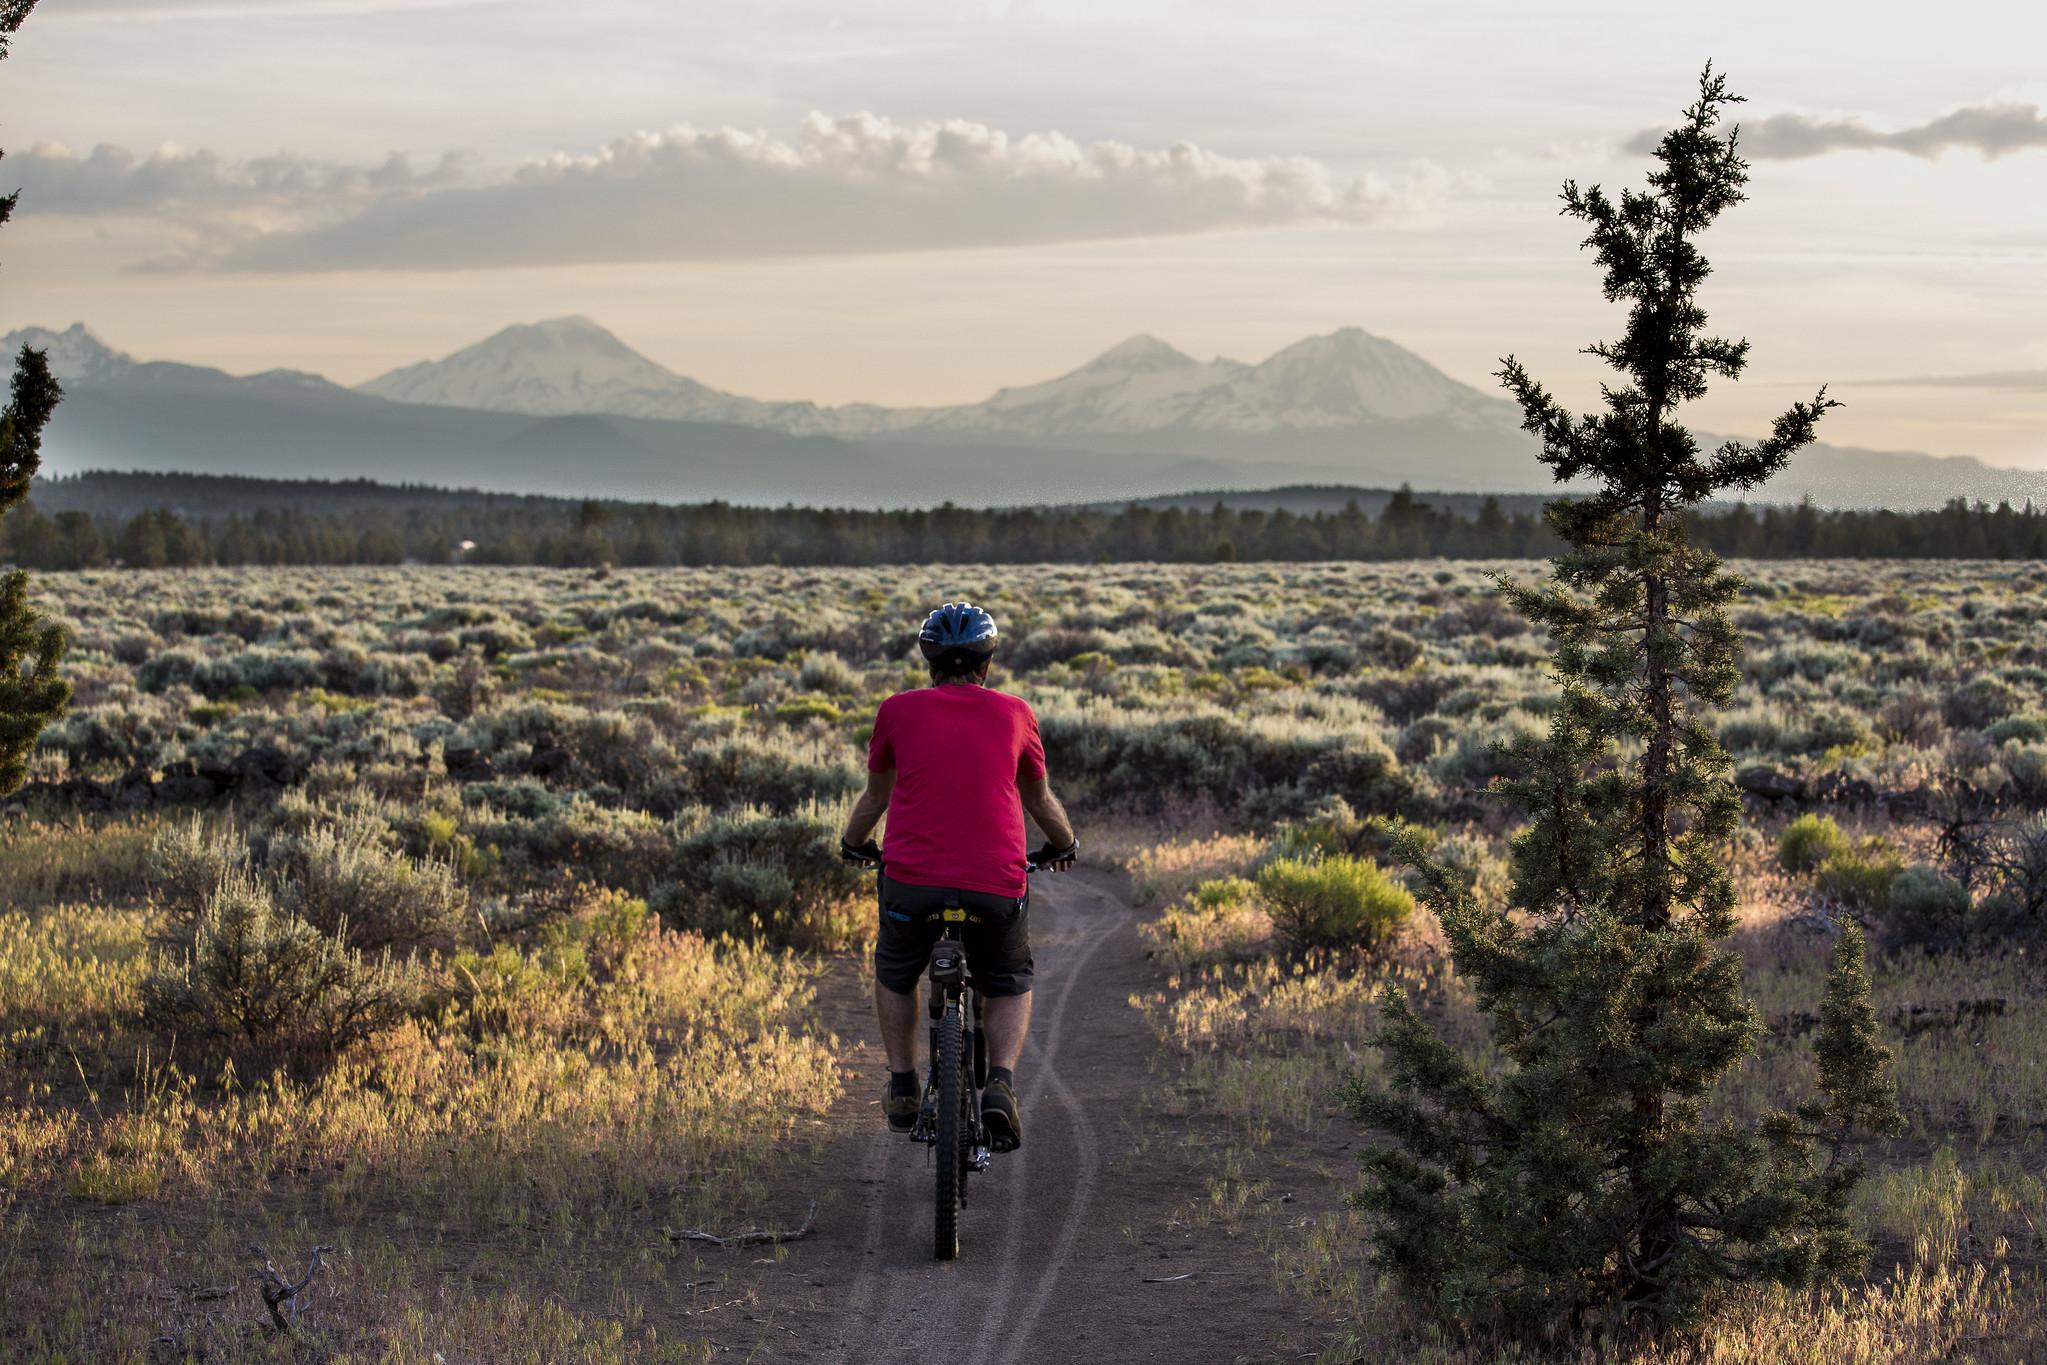 A person mountain biking by Cline Butte